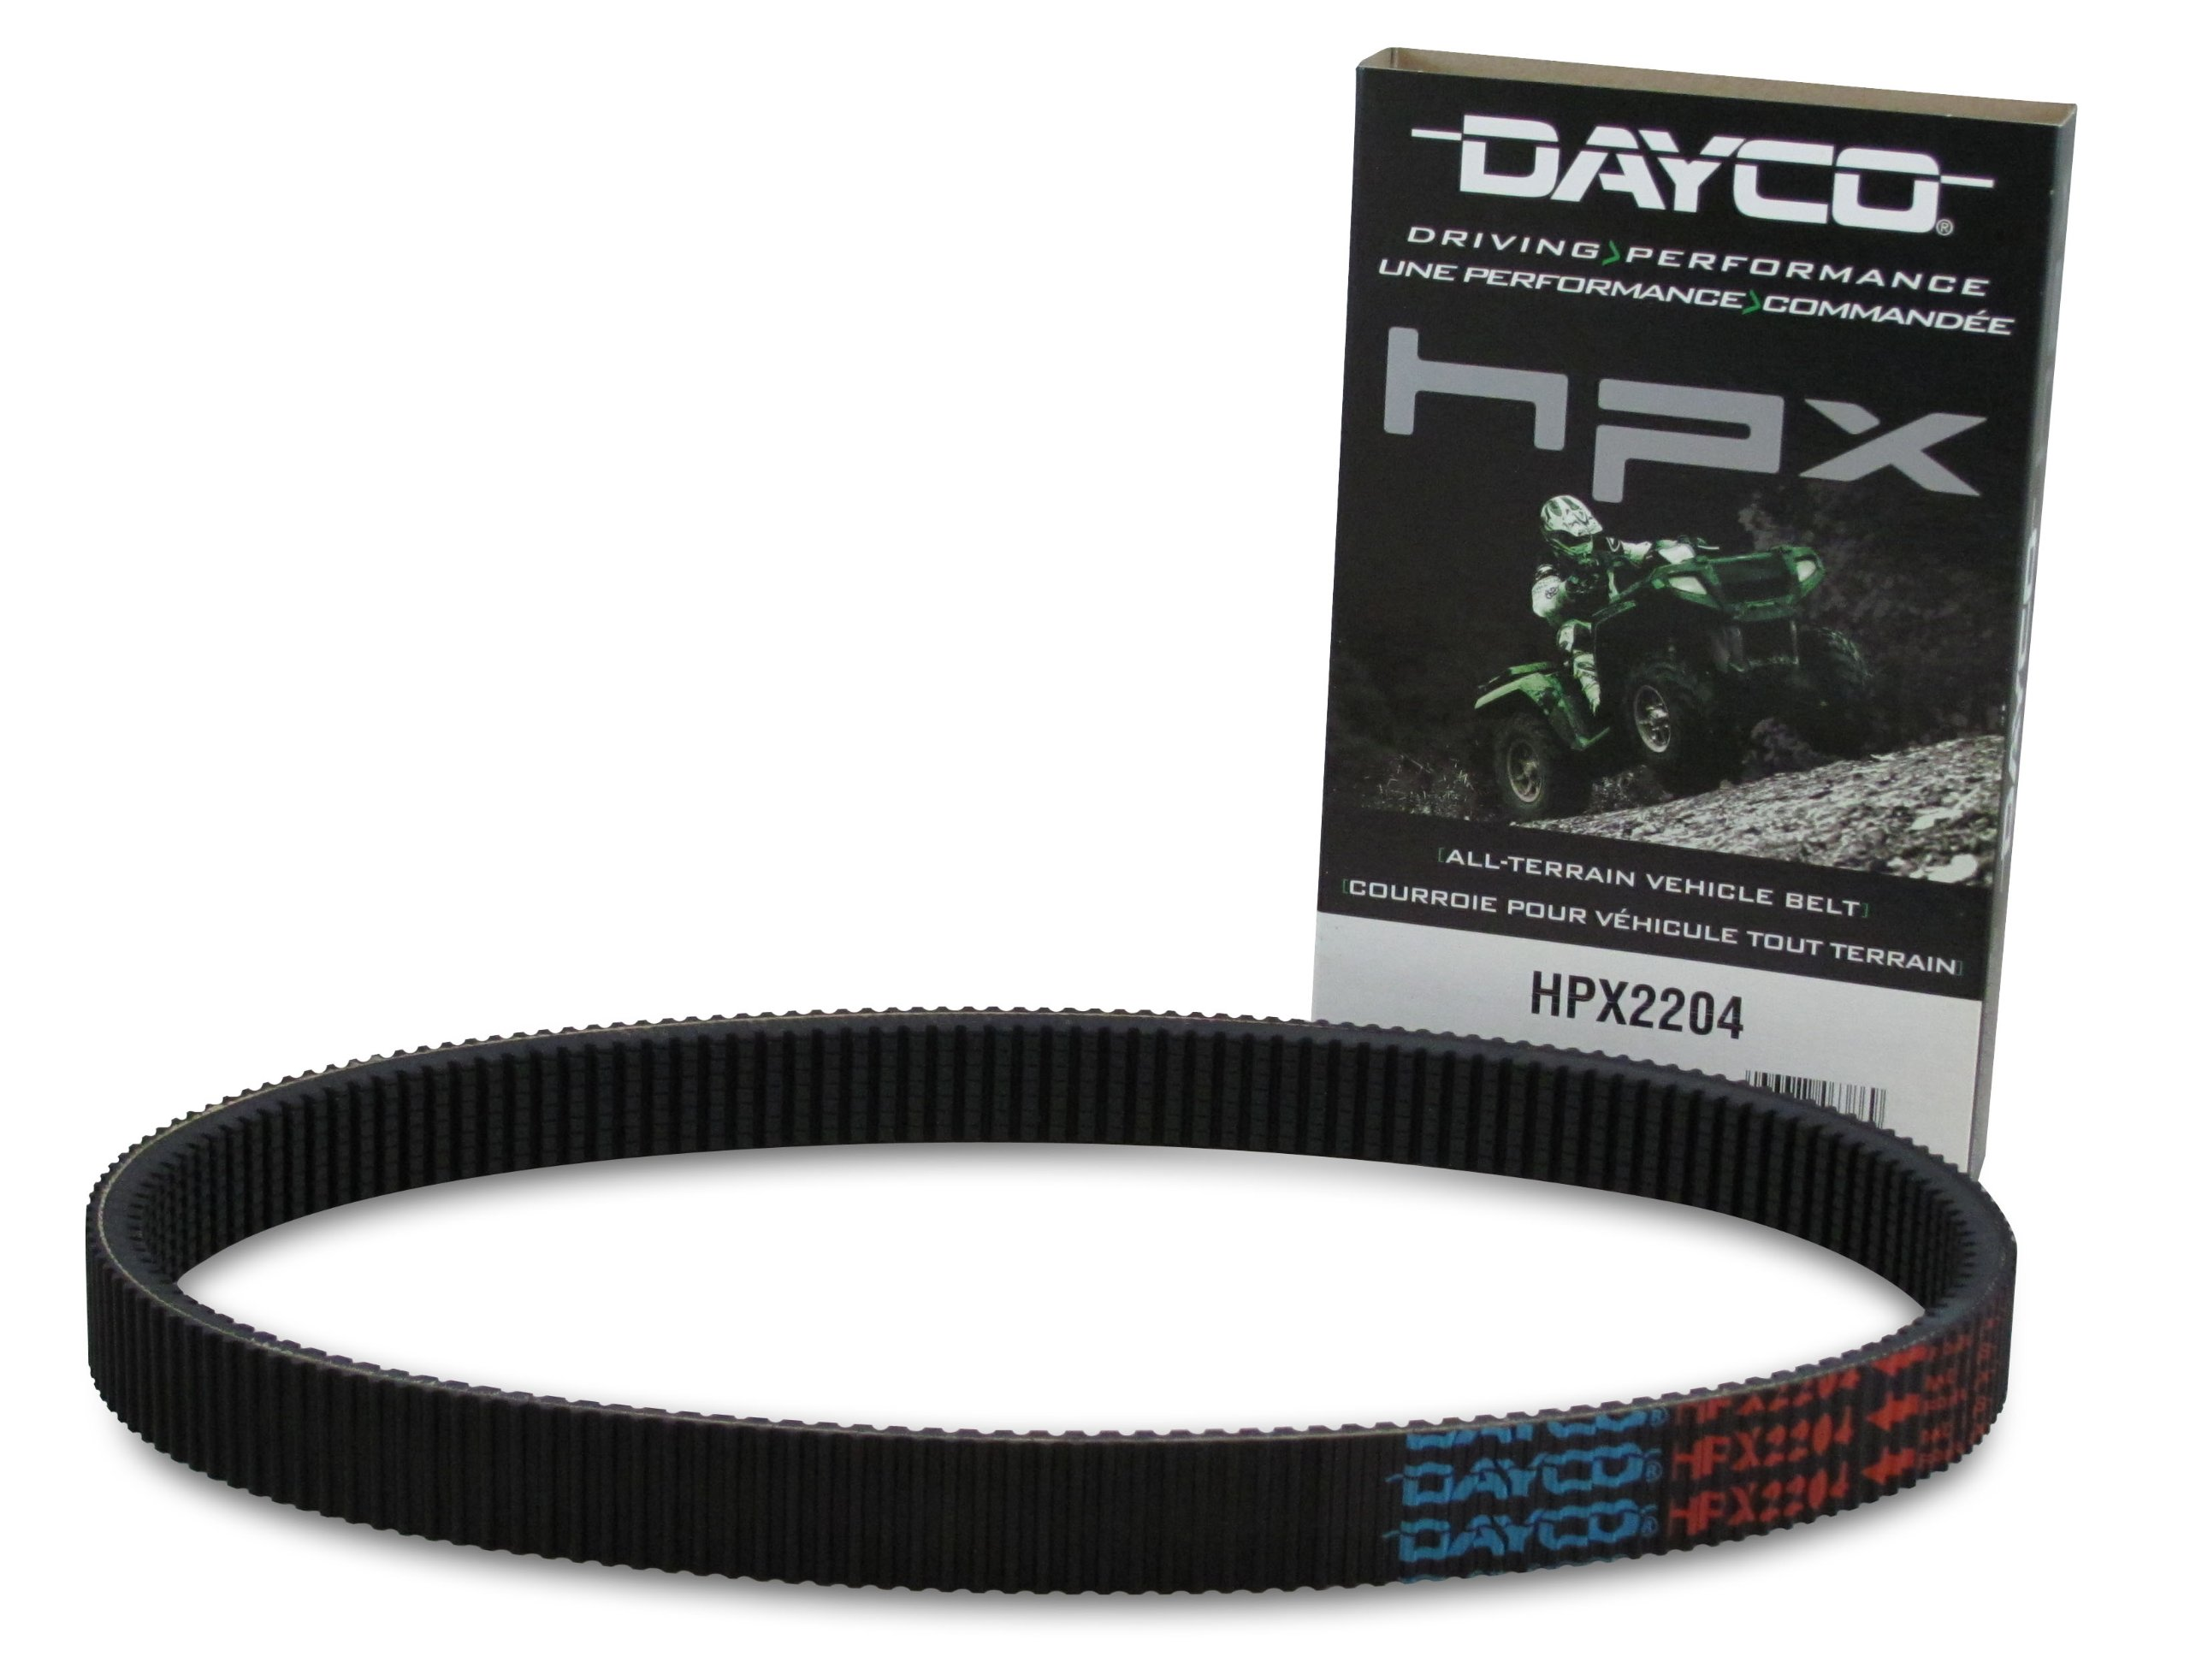 Dayco HPX2204 HPX High Performance Extreme ATV/UTV Drive Belt by Dayco